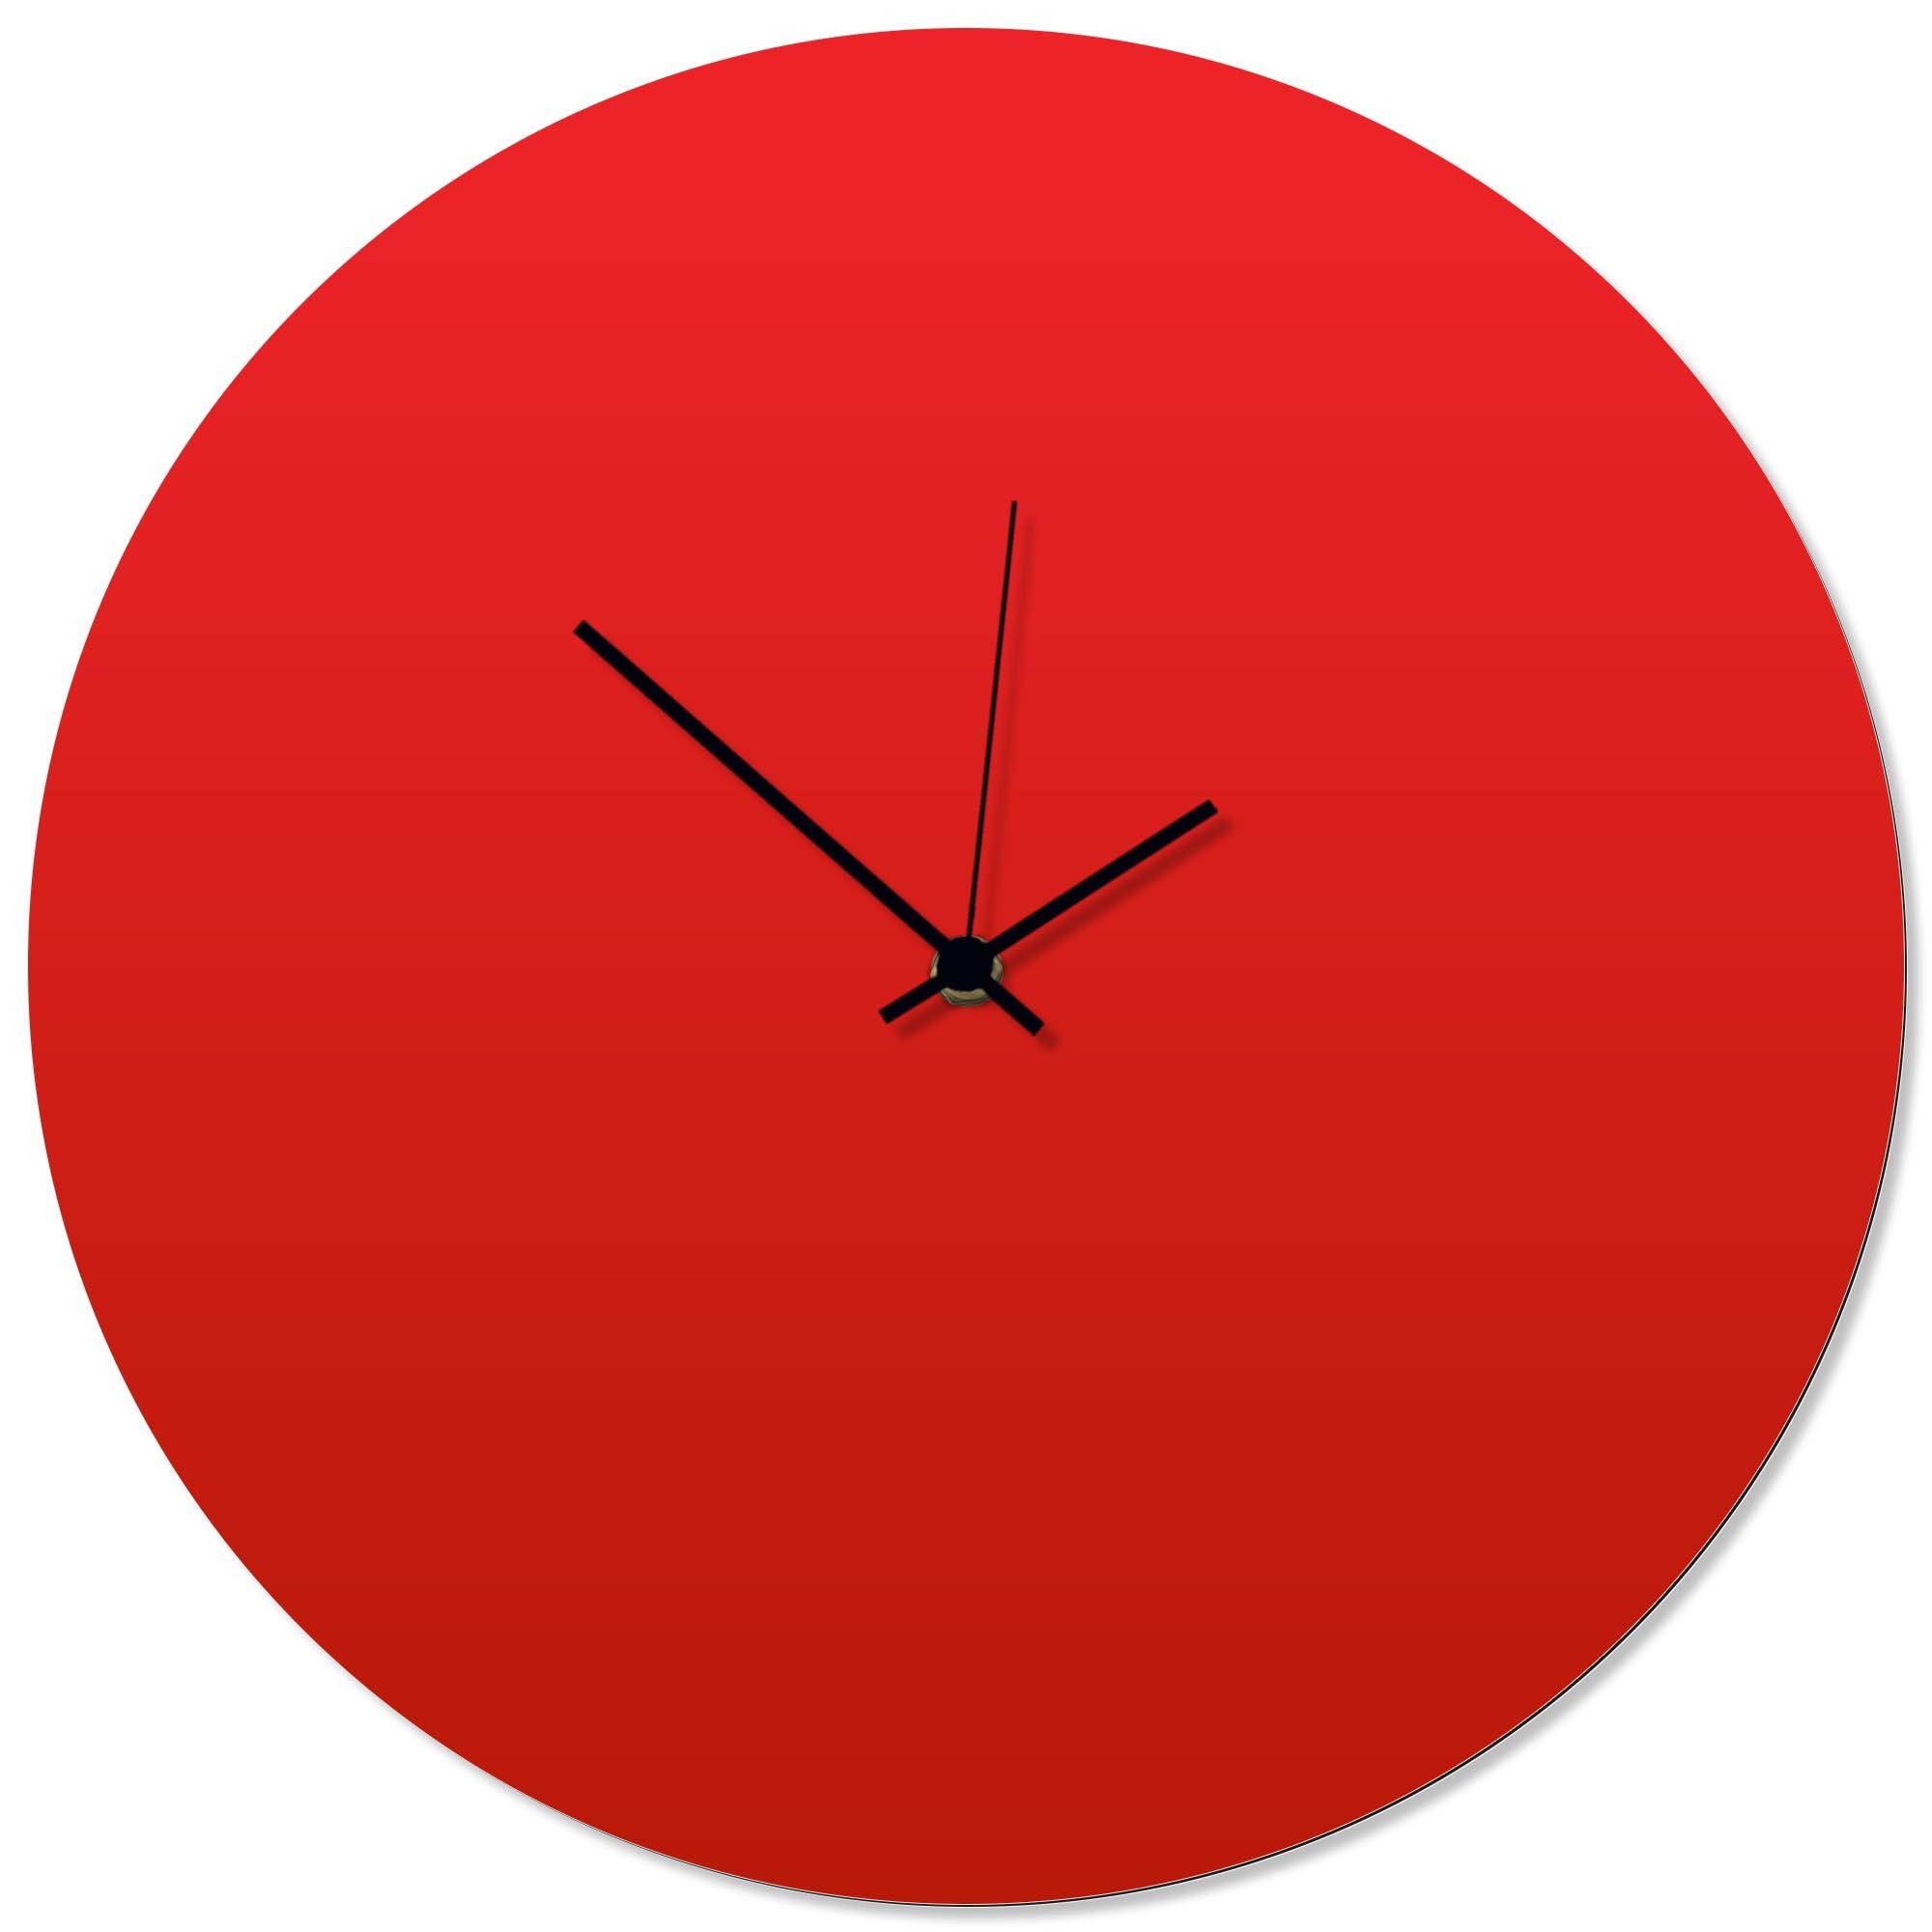 Redout Black Circle Clock 16x16in. Aluminum Polymetal